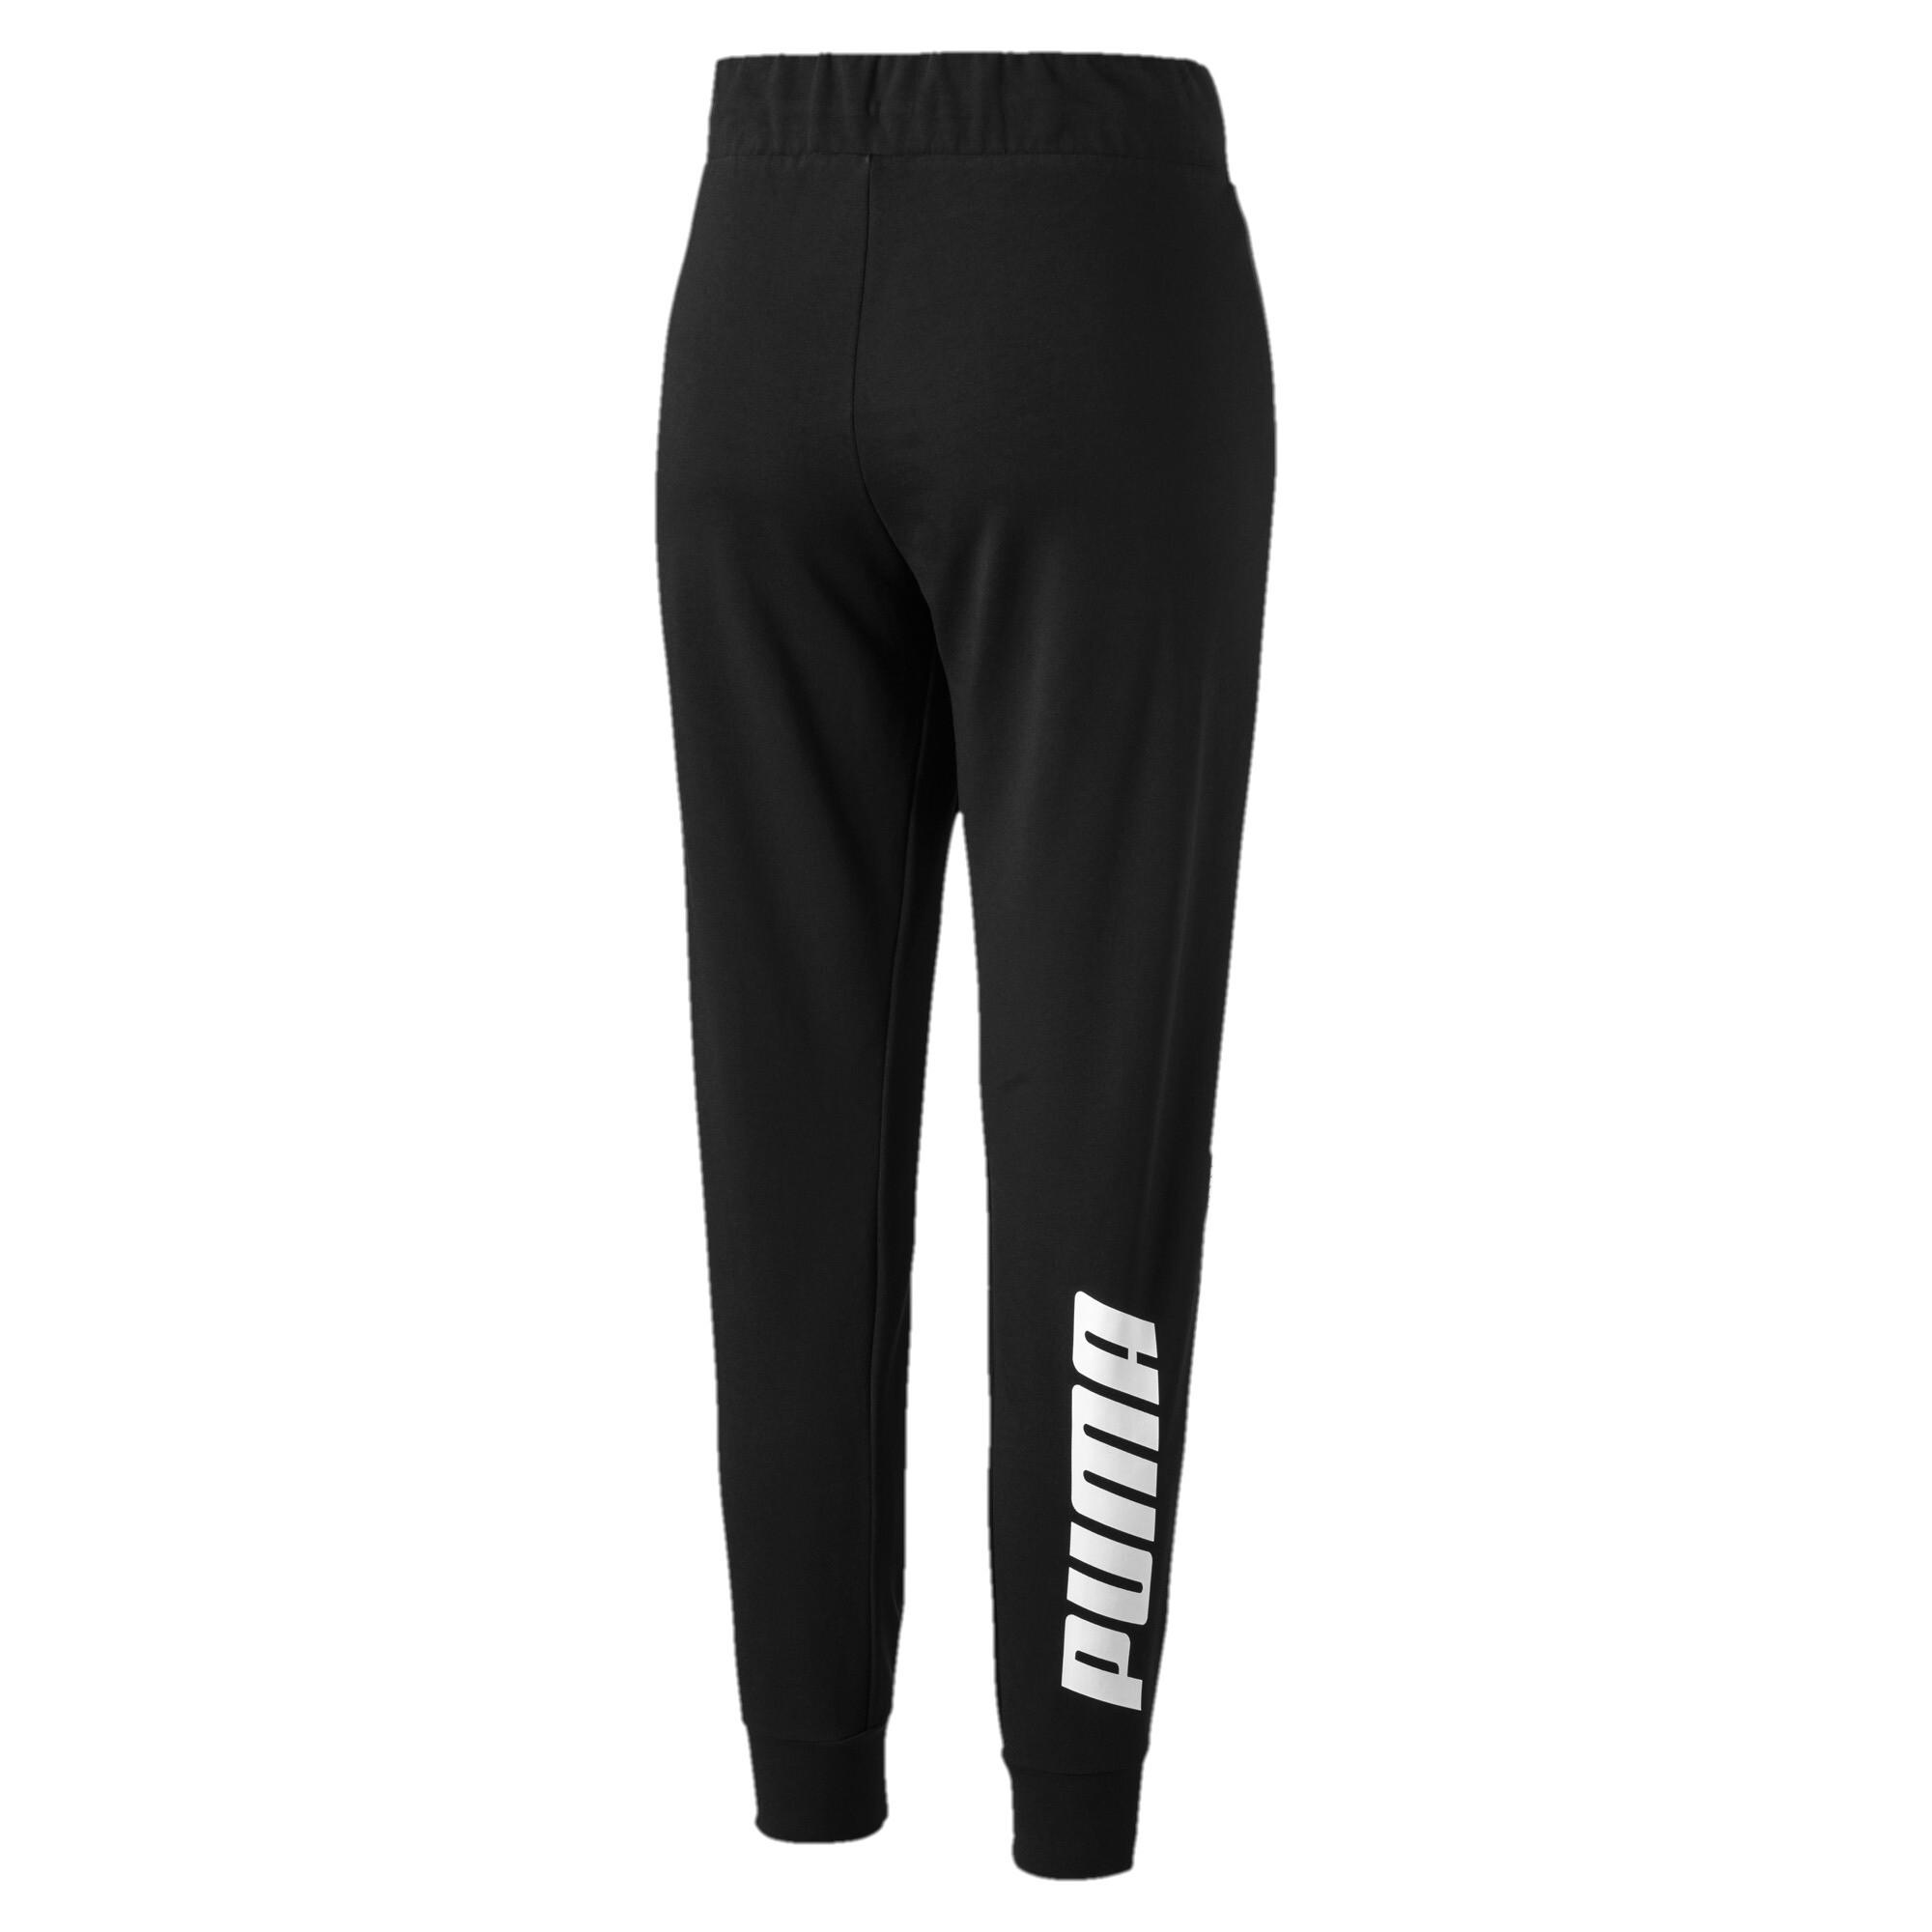 PUMA-Modern-Sports-Pants-Women-Knitted-Pants-Basics thumbnail 3